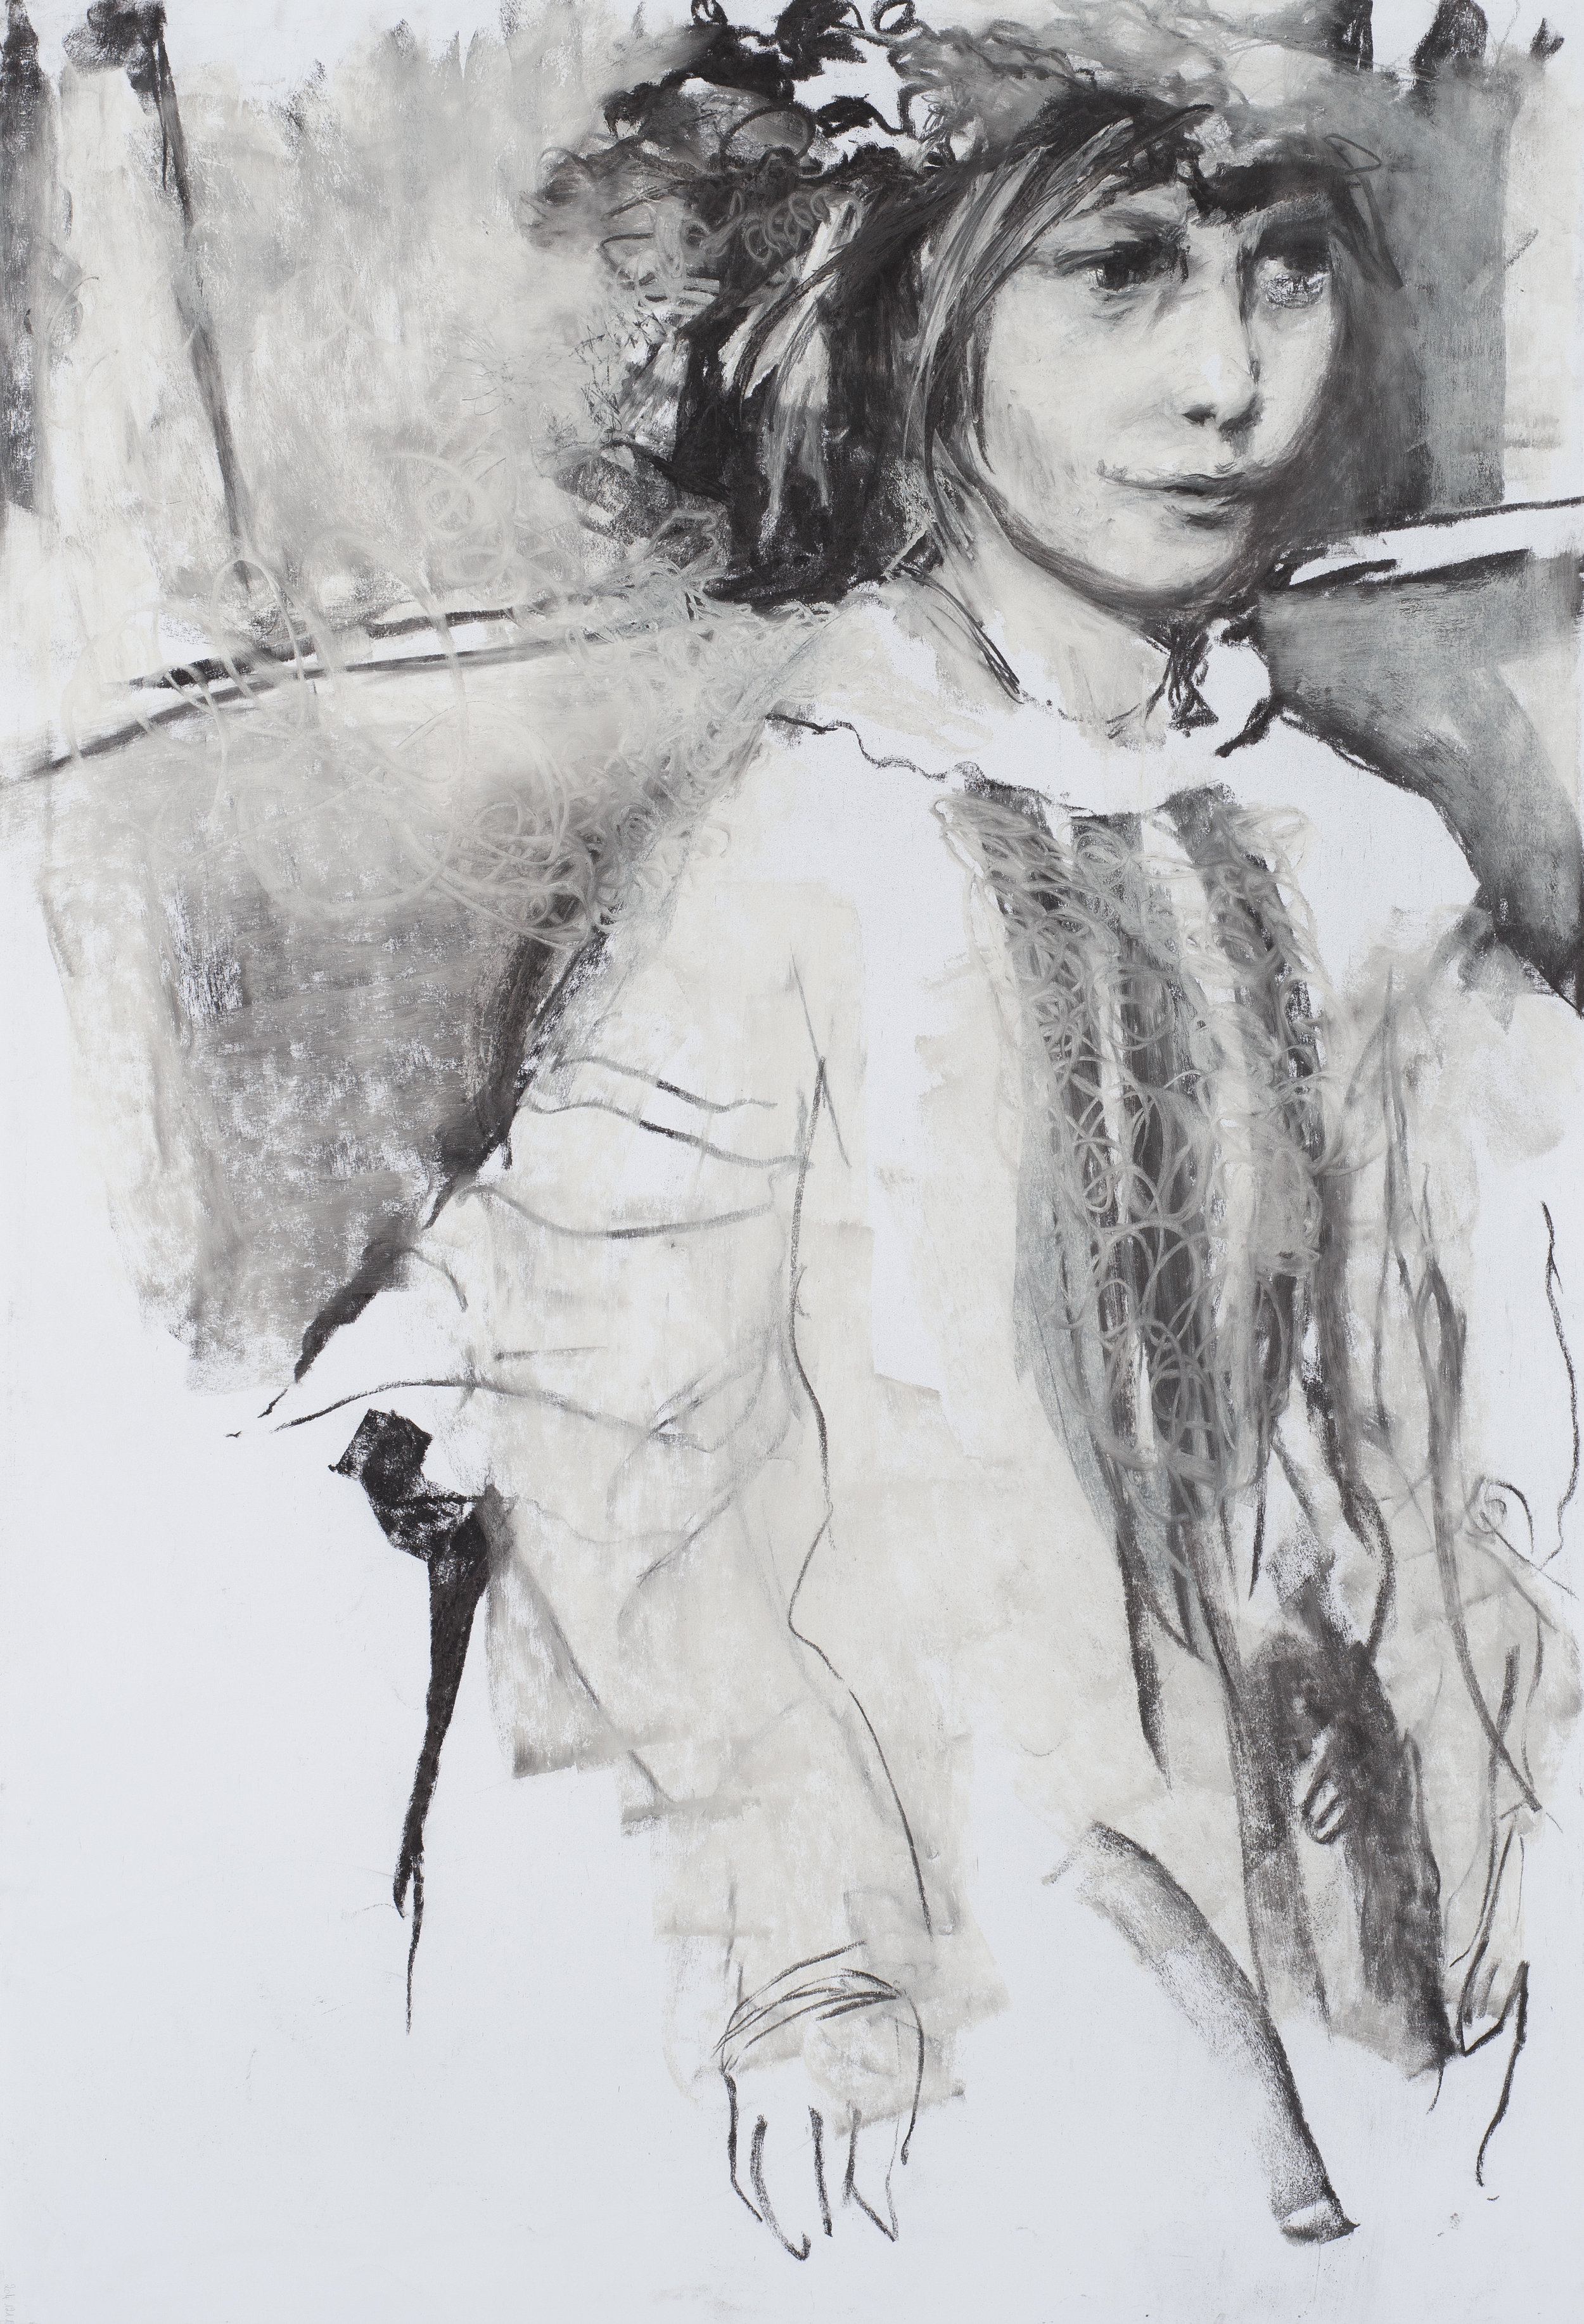 Eros couronné de roses 5 - 201675 x 110 cm